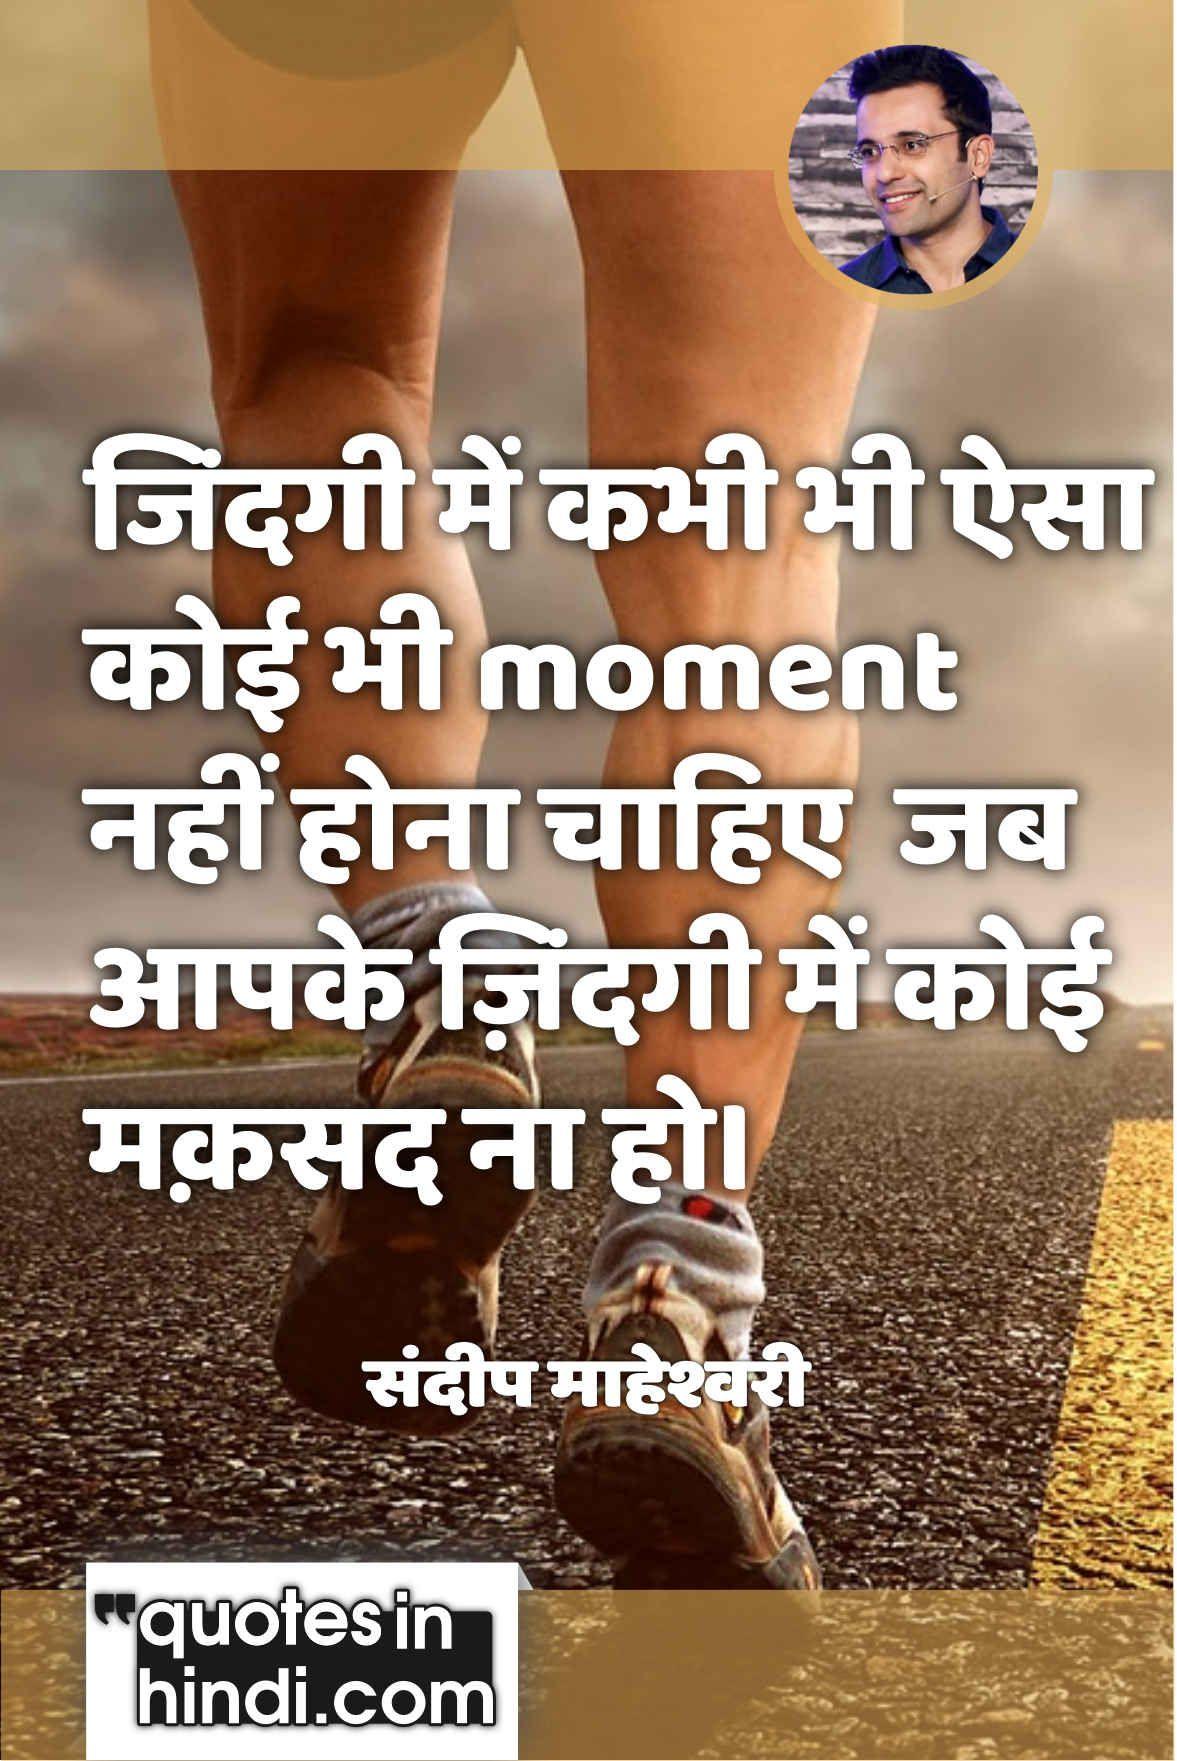 Pin by Mehvish Shaikh on Thoughts Sandeep maheshwari